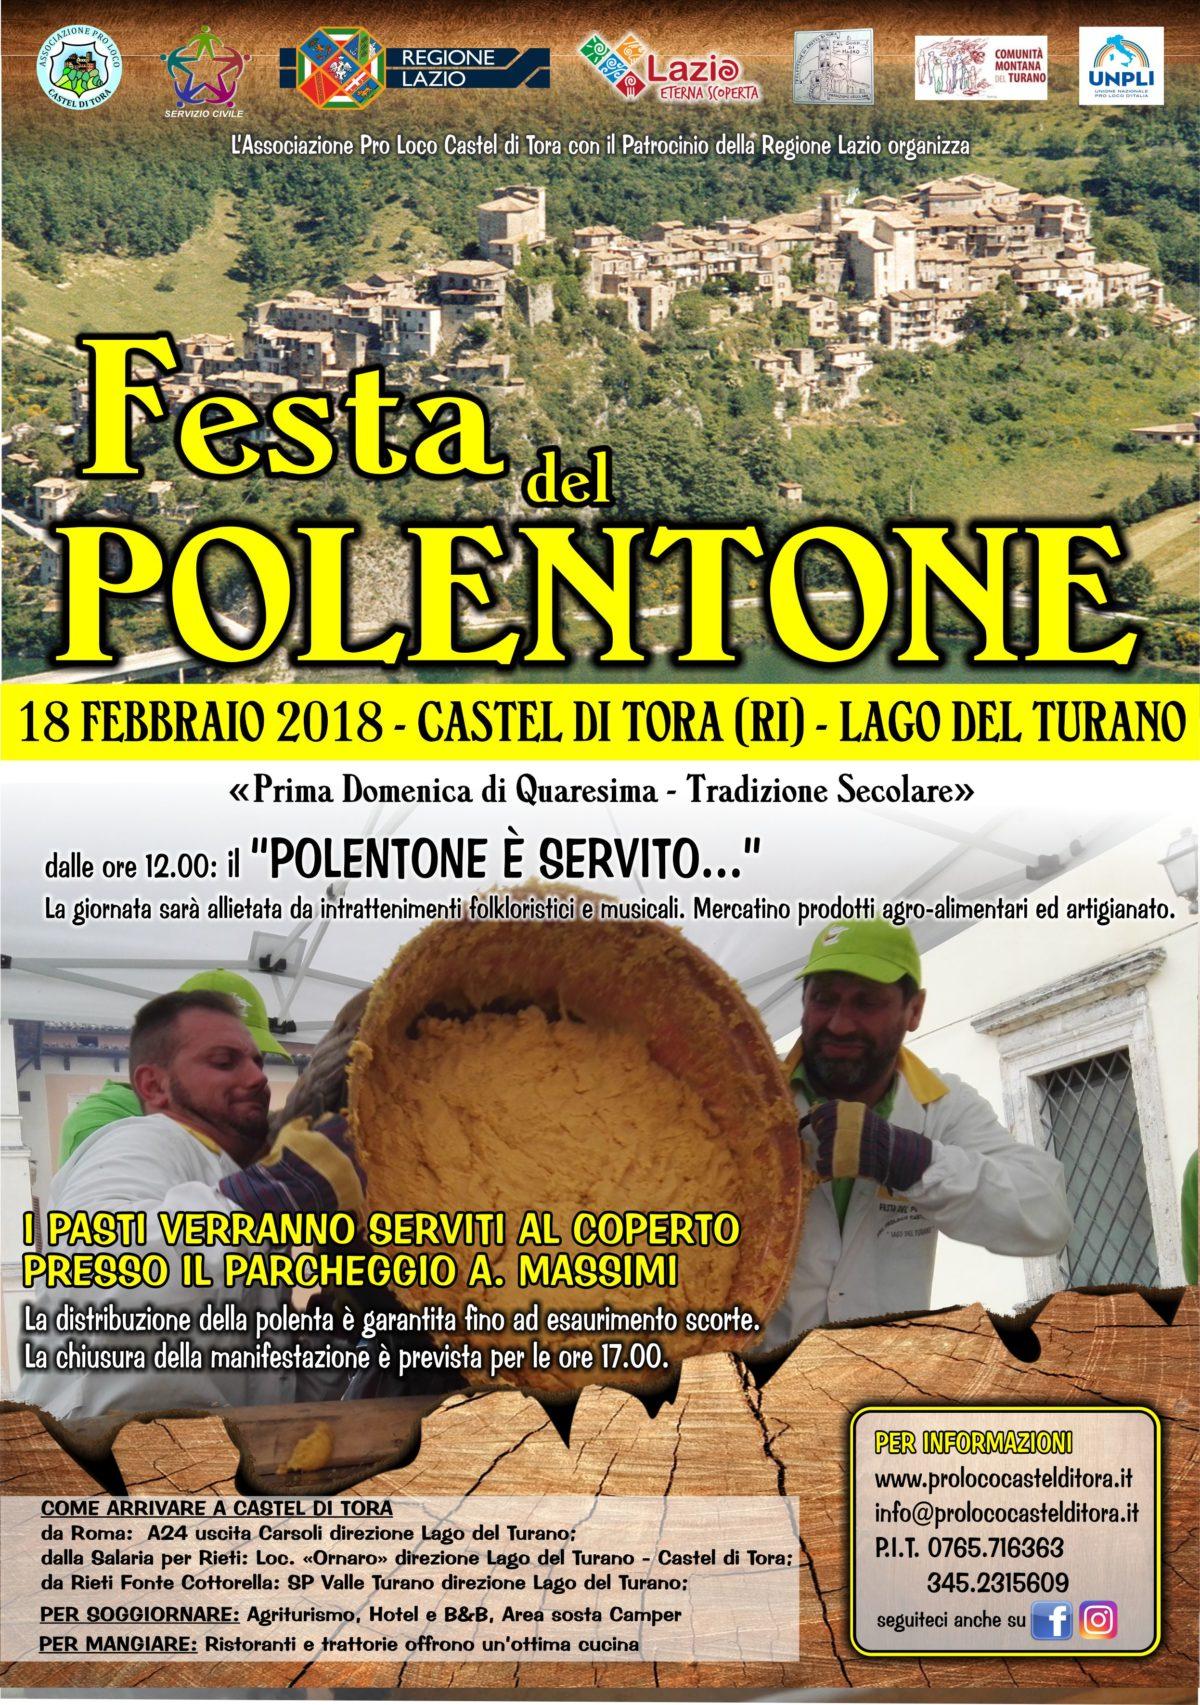 Polentone 2018